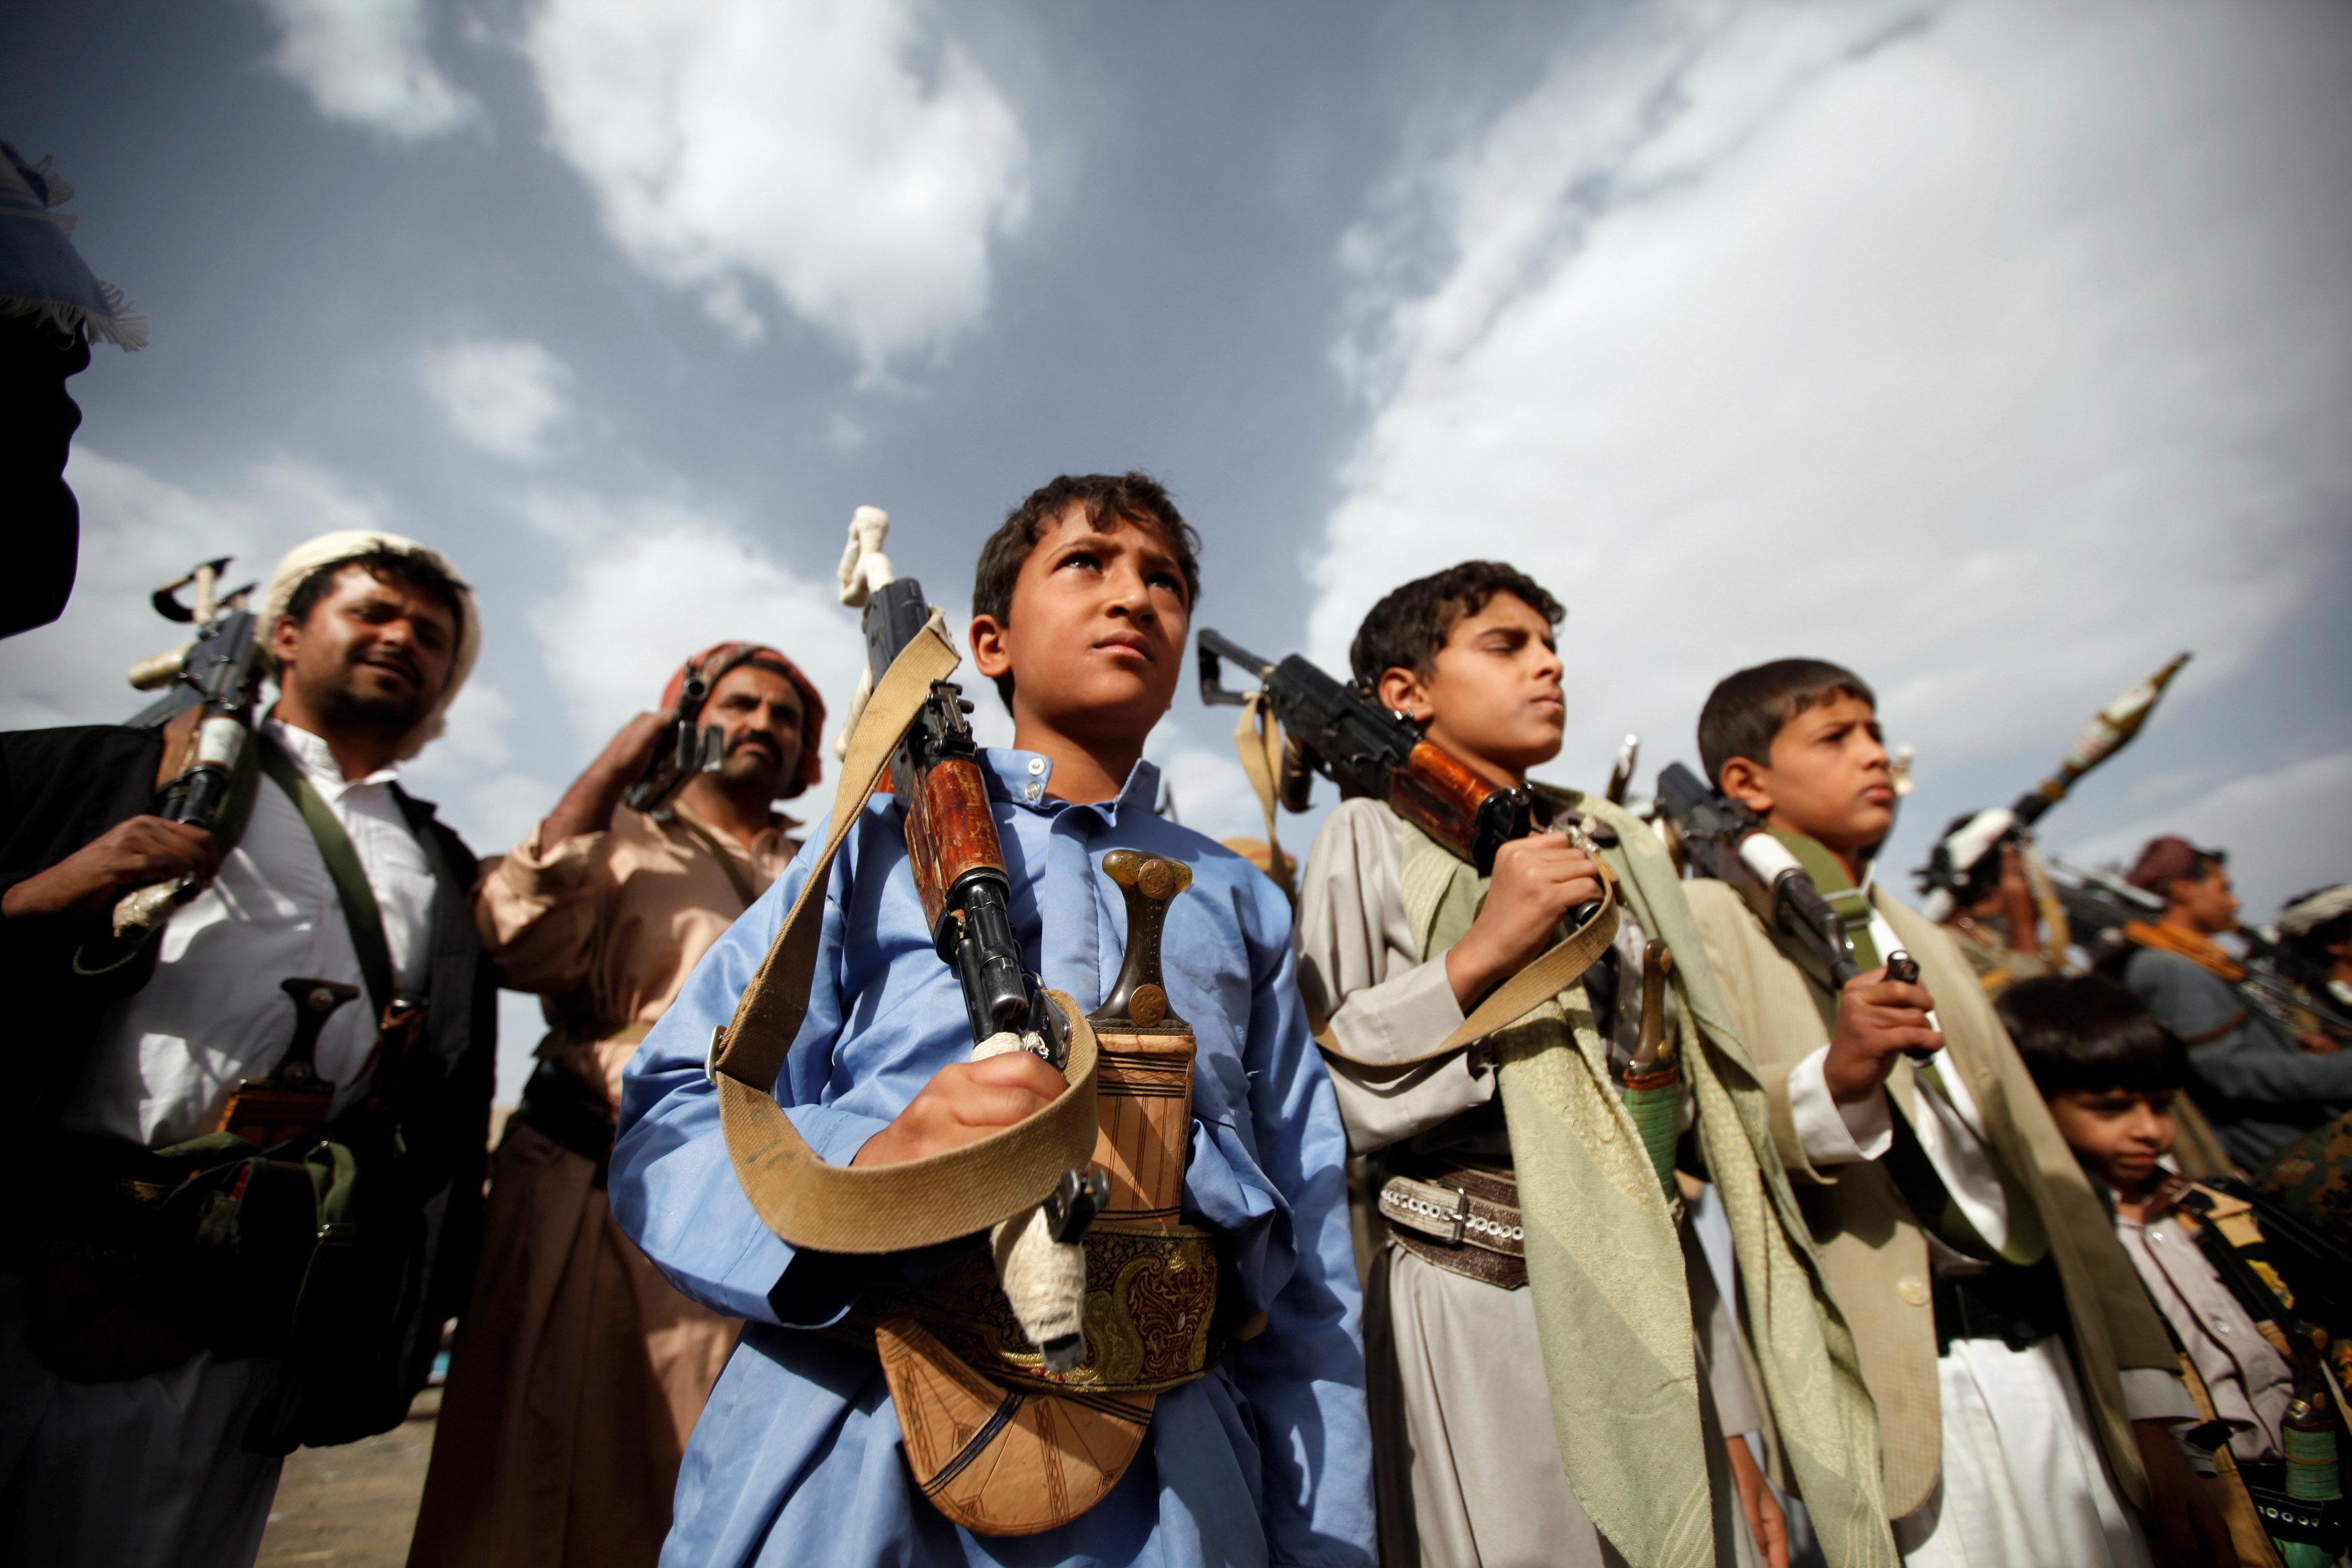 Boys attend a pro-Houthi tribal gathering in Sana'a, Yemen, on June 20, 2016.